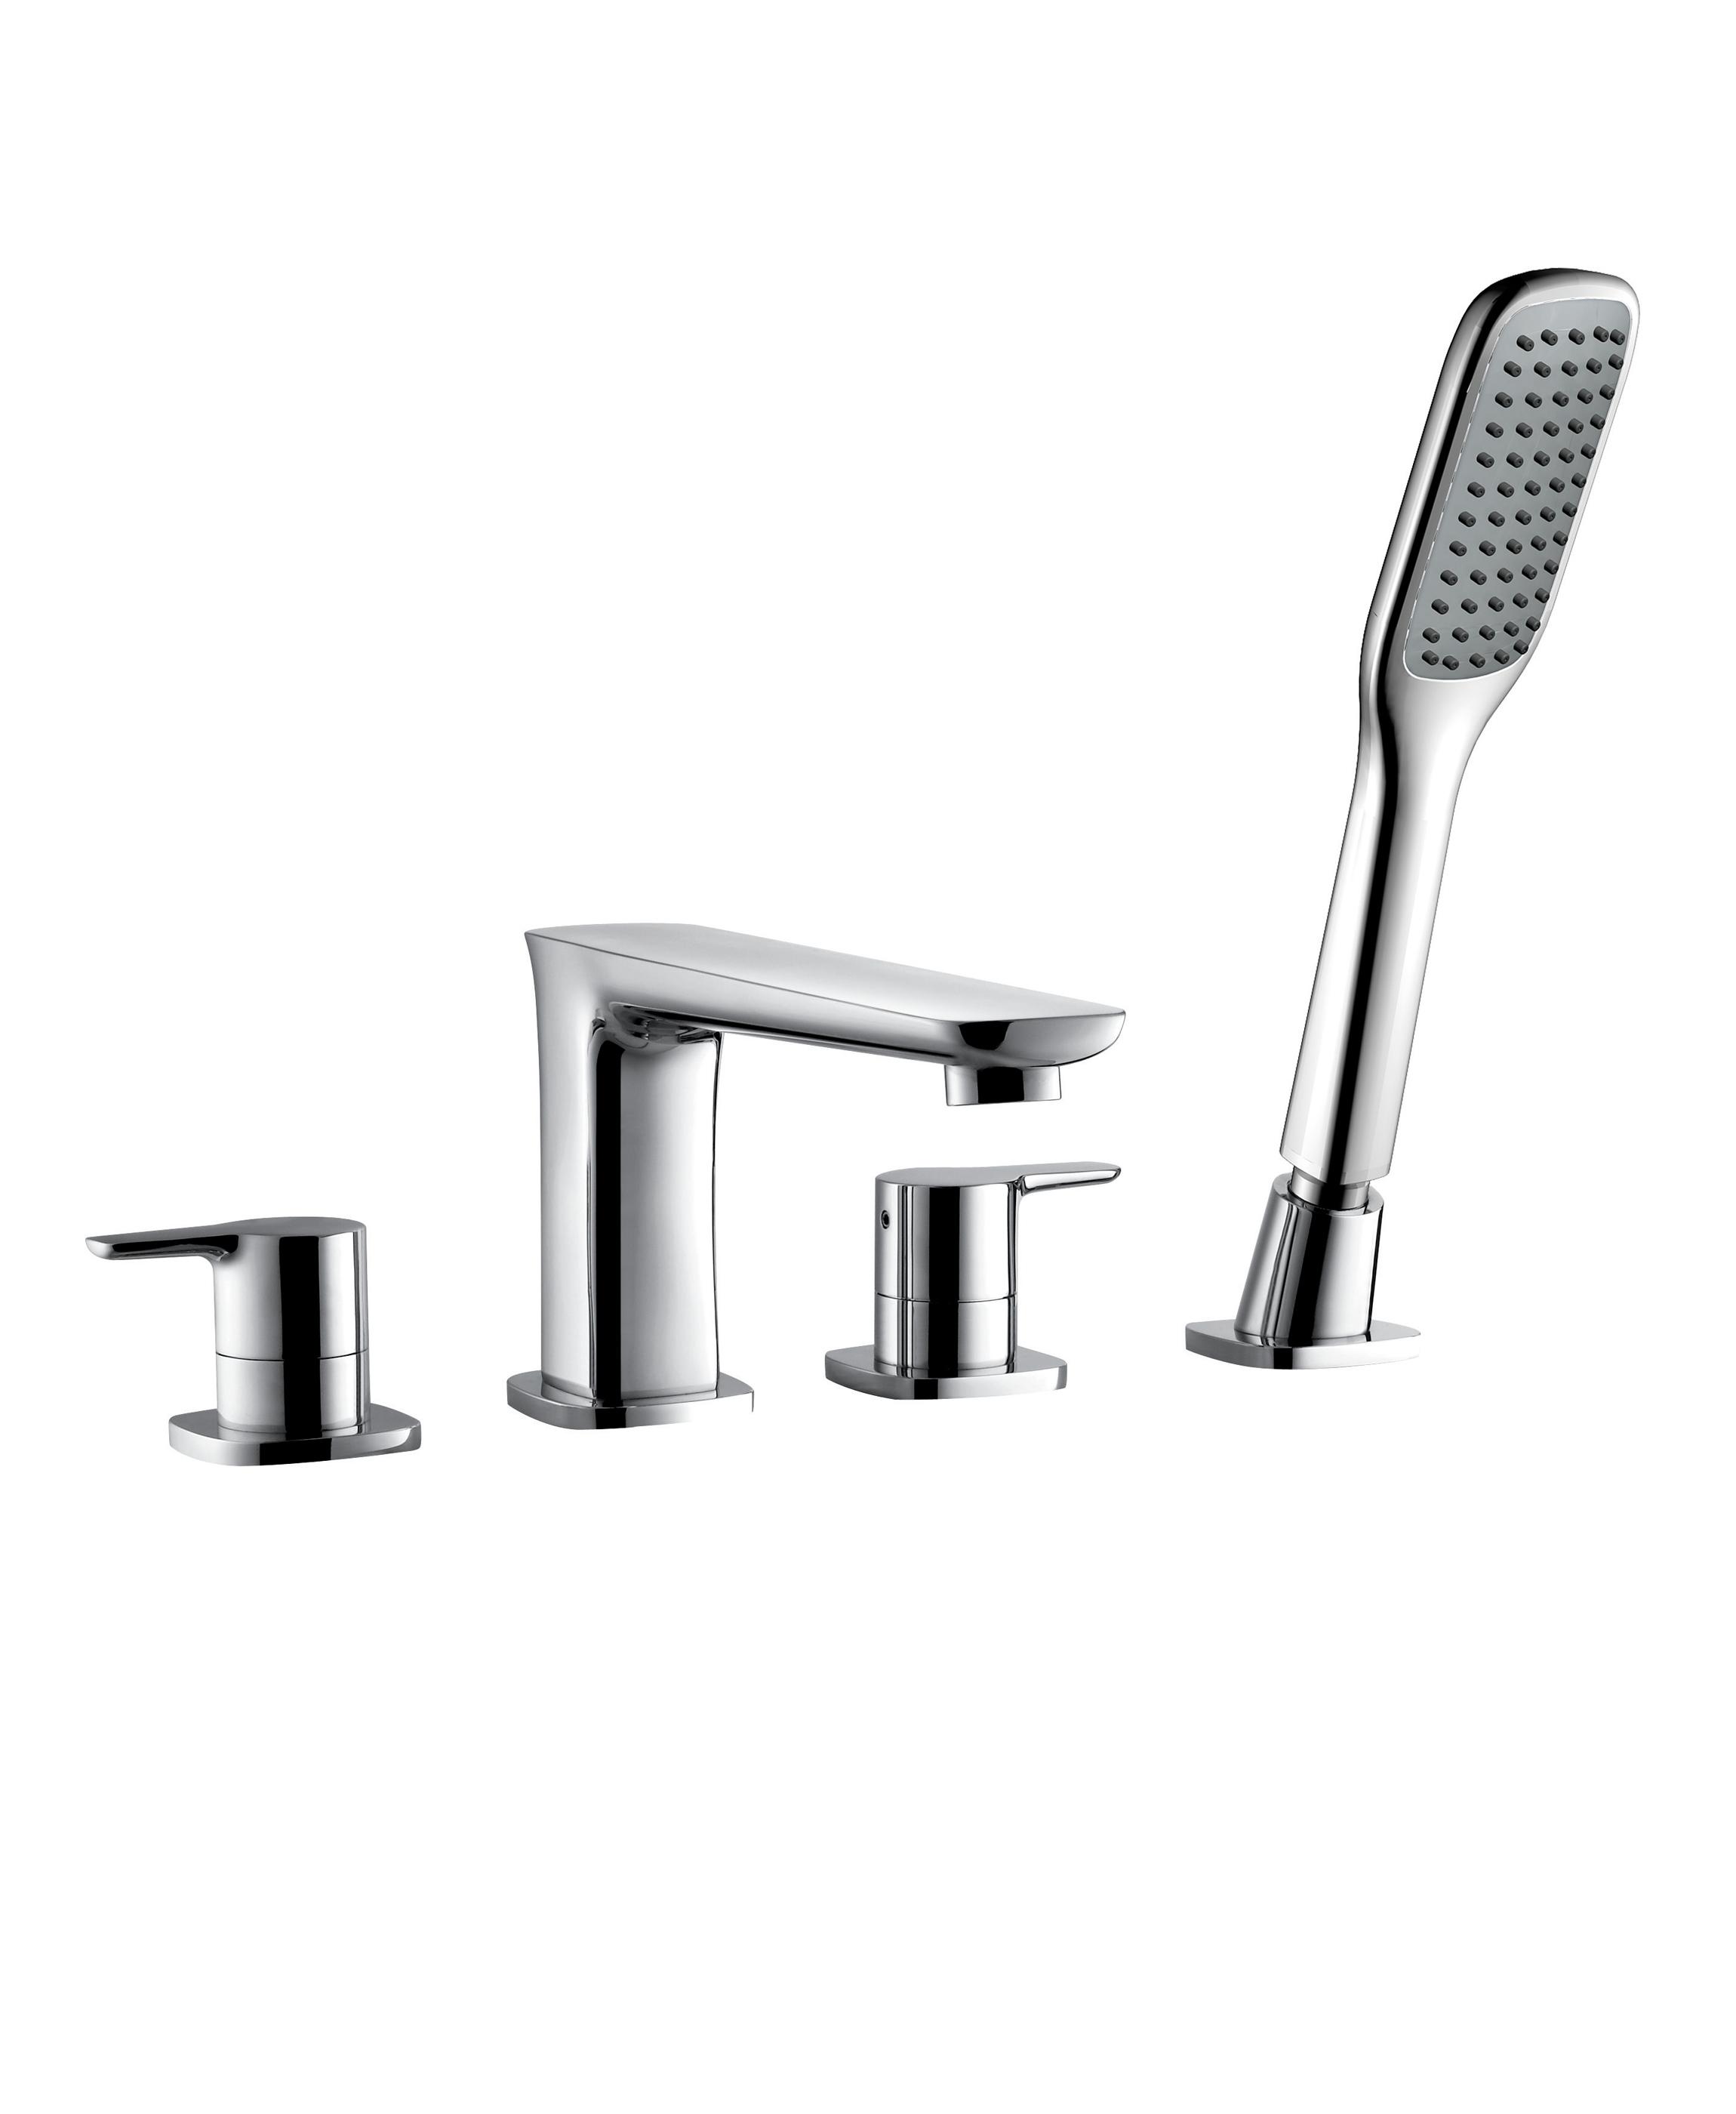 Rain 4 Hole Bath Shower Mixer Aqualla Brassware